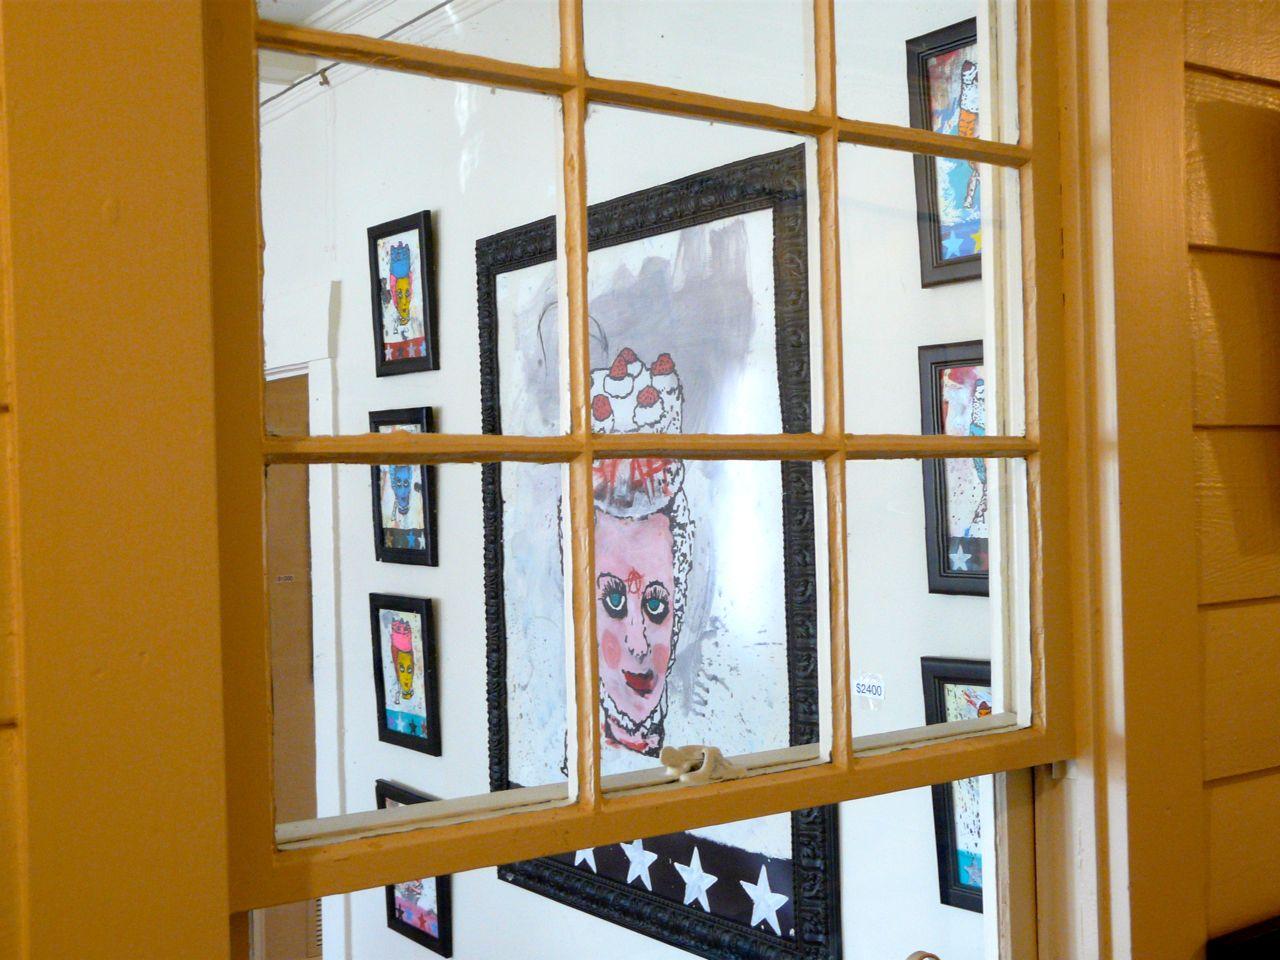 versus gallery interior through window art.jpg